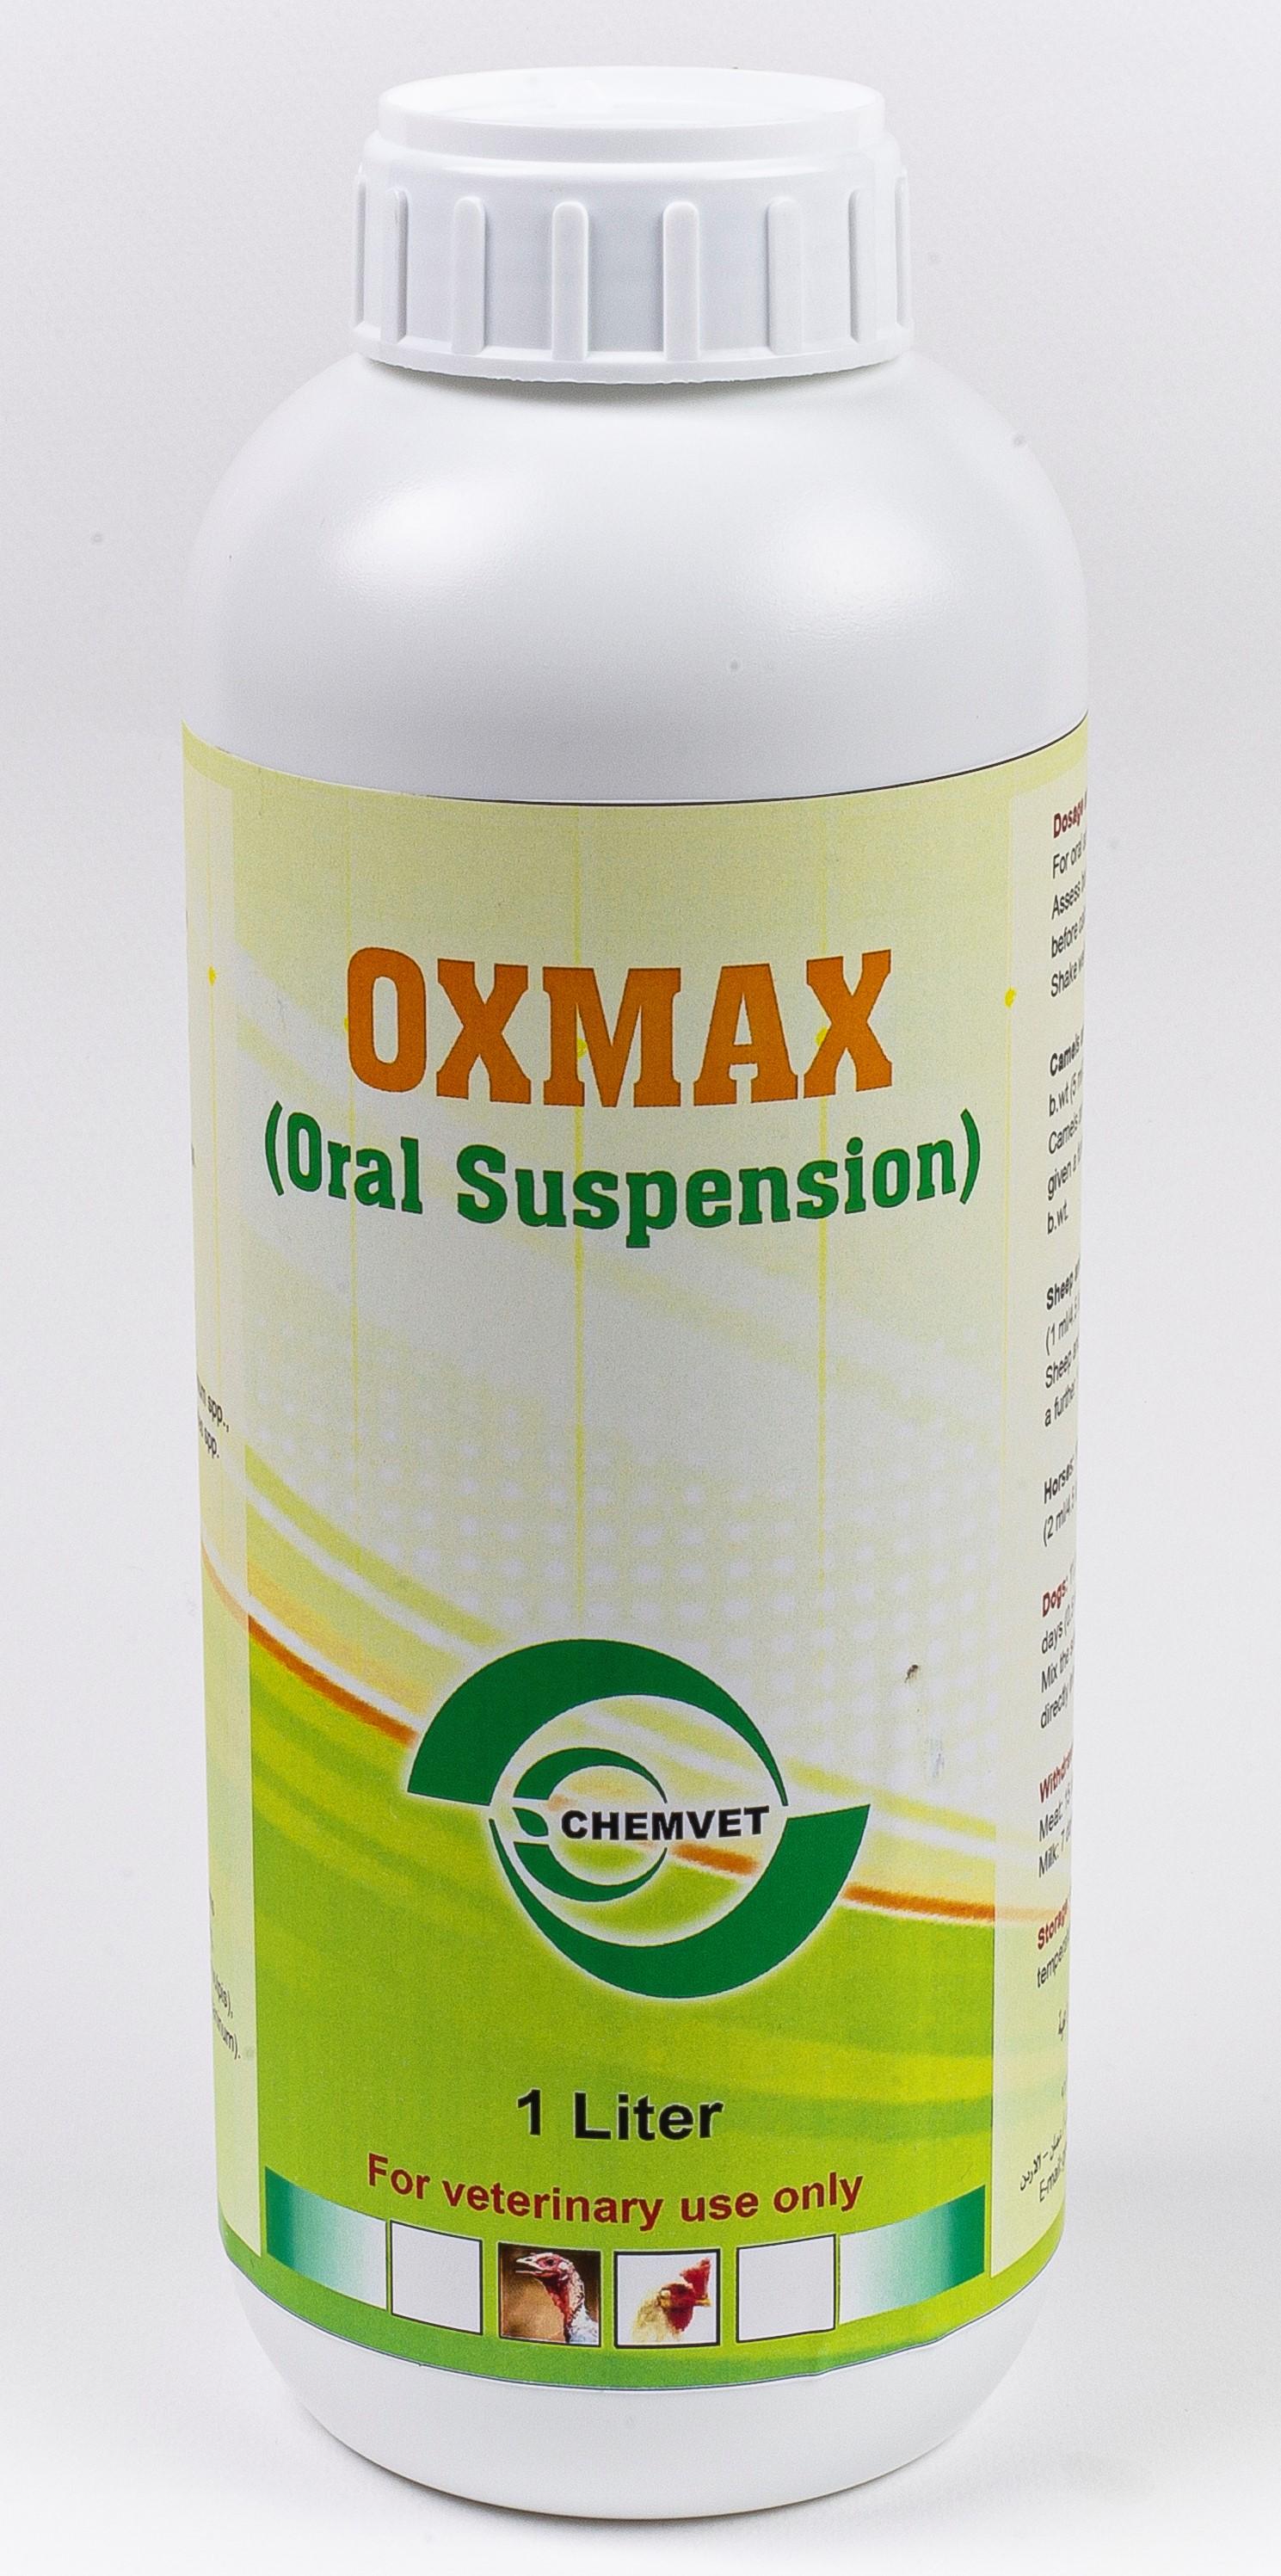 OXMAX